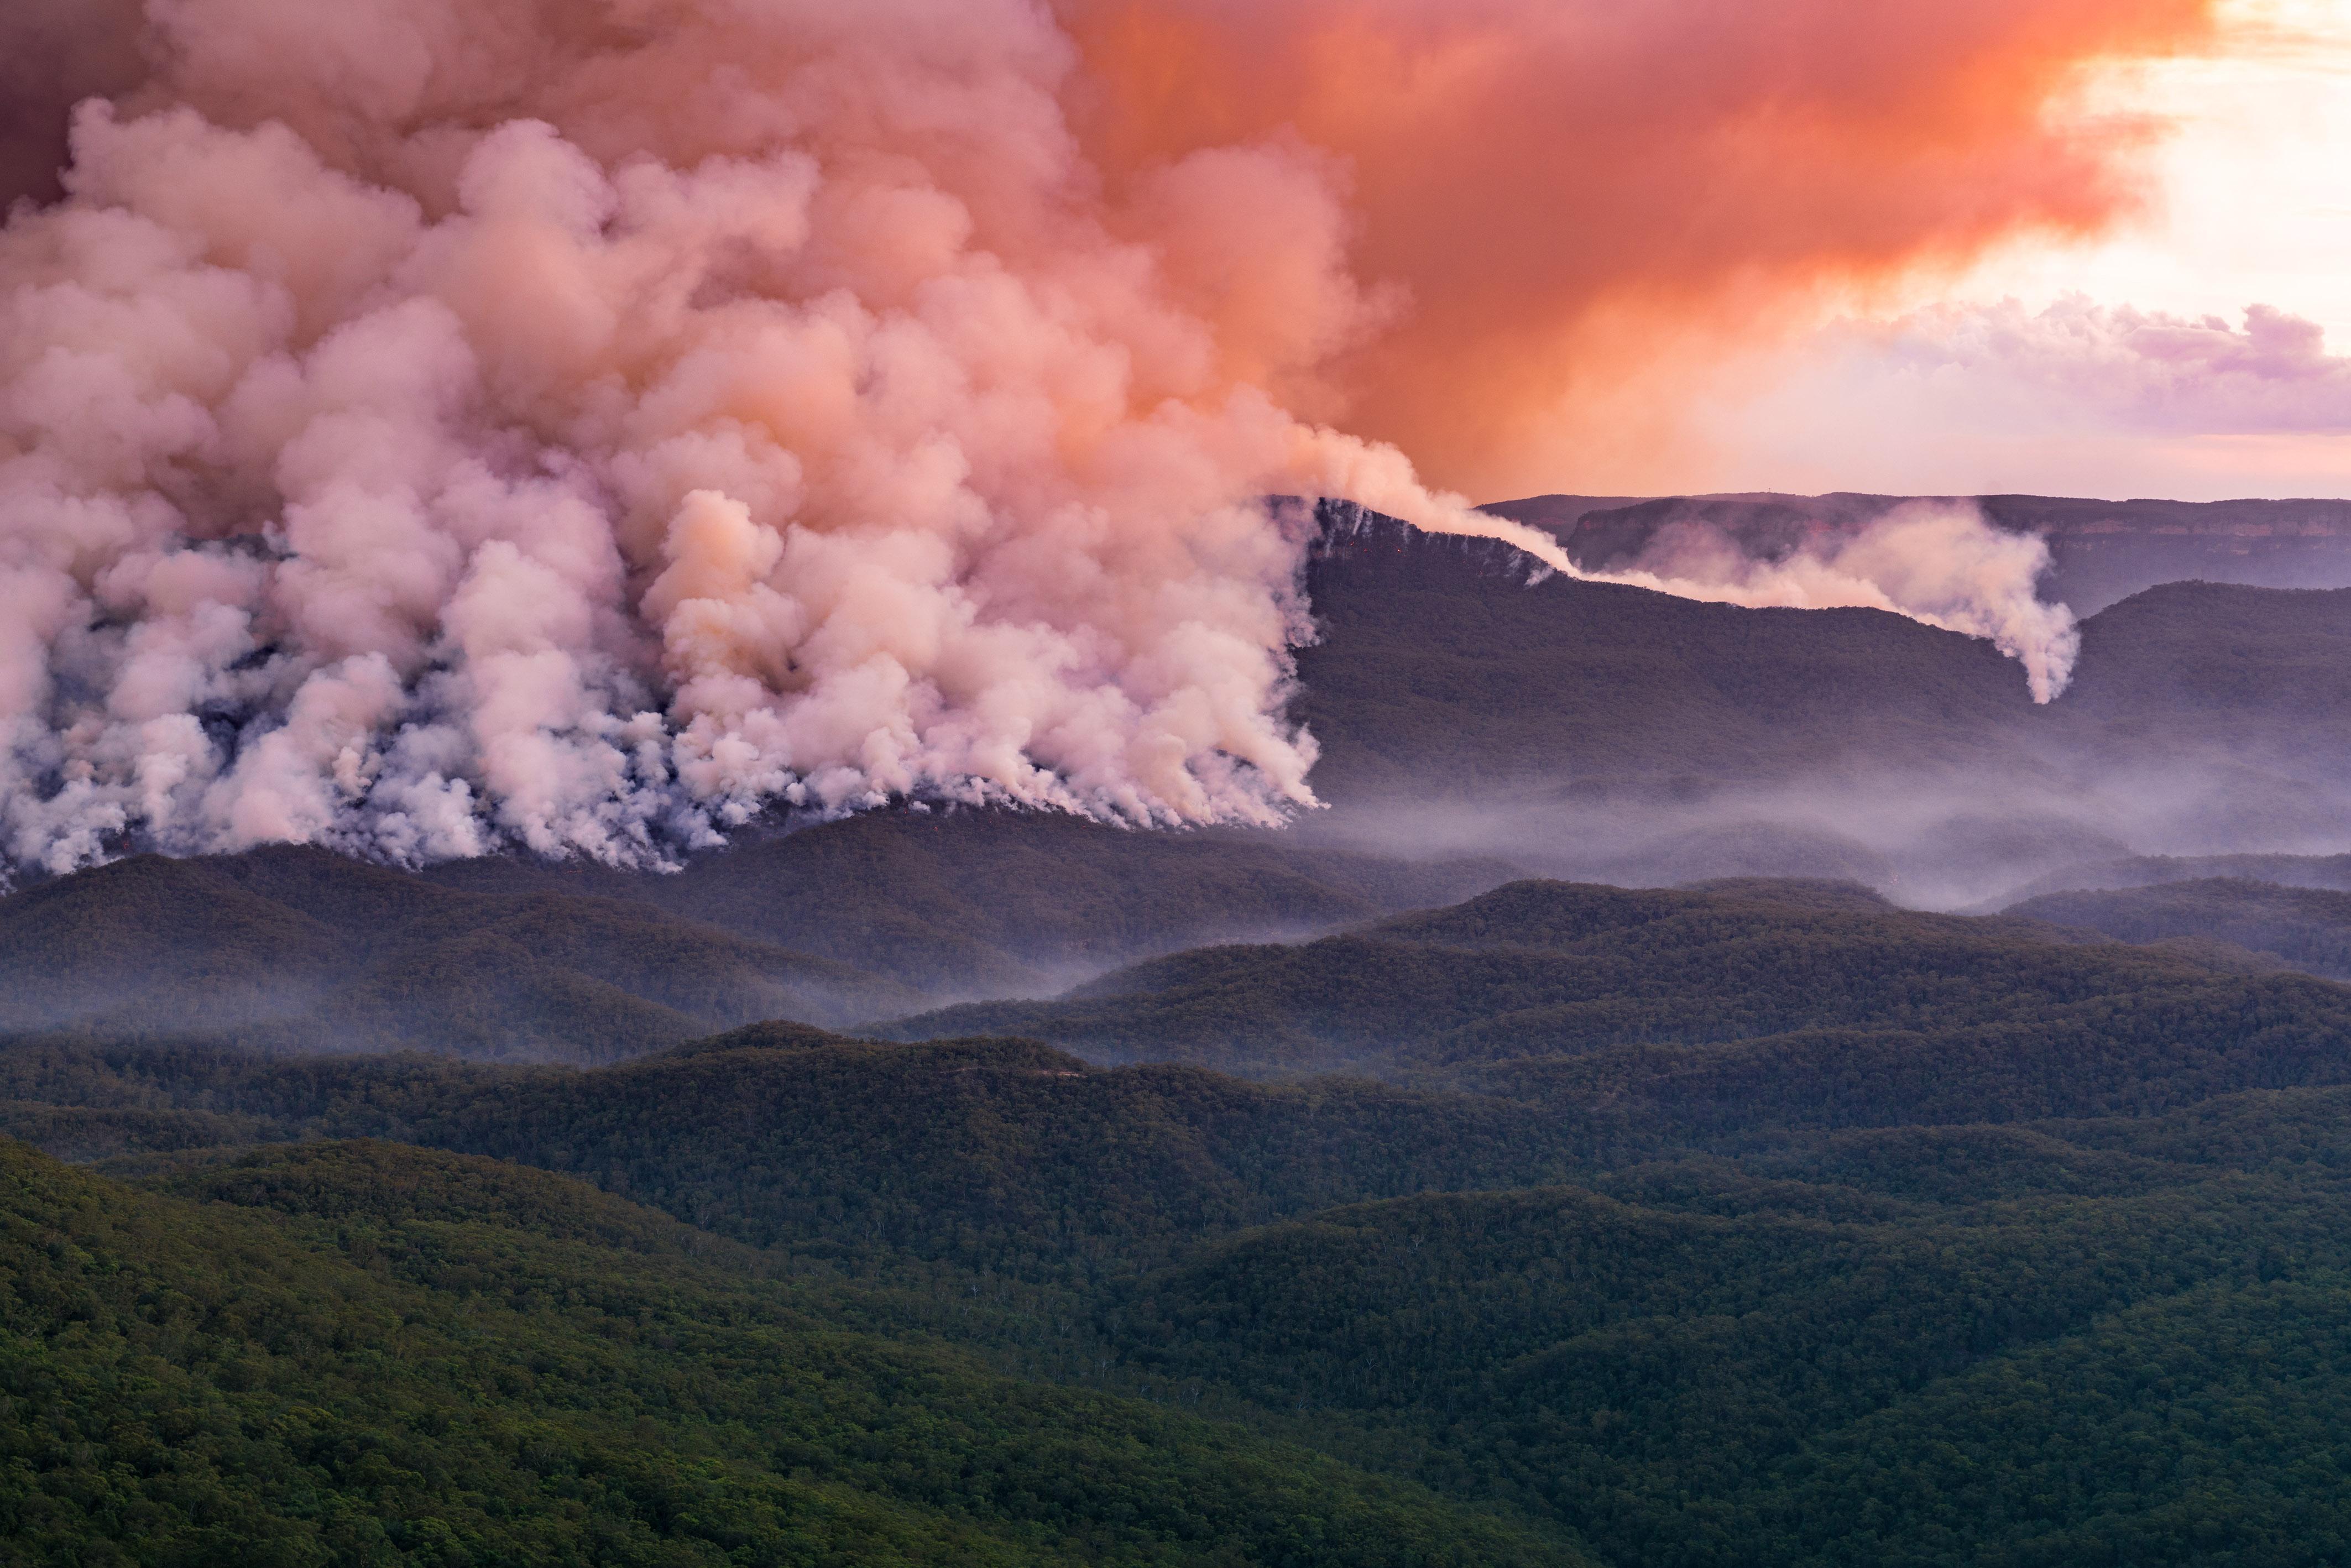 BUSH FIRE LOOKS LIKE ERUPTION